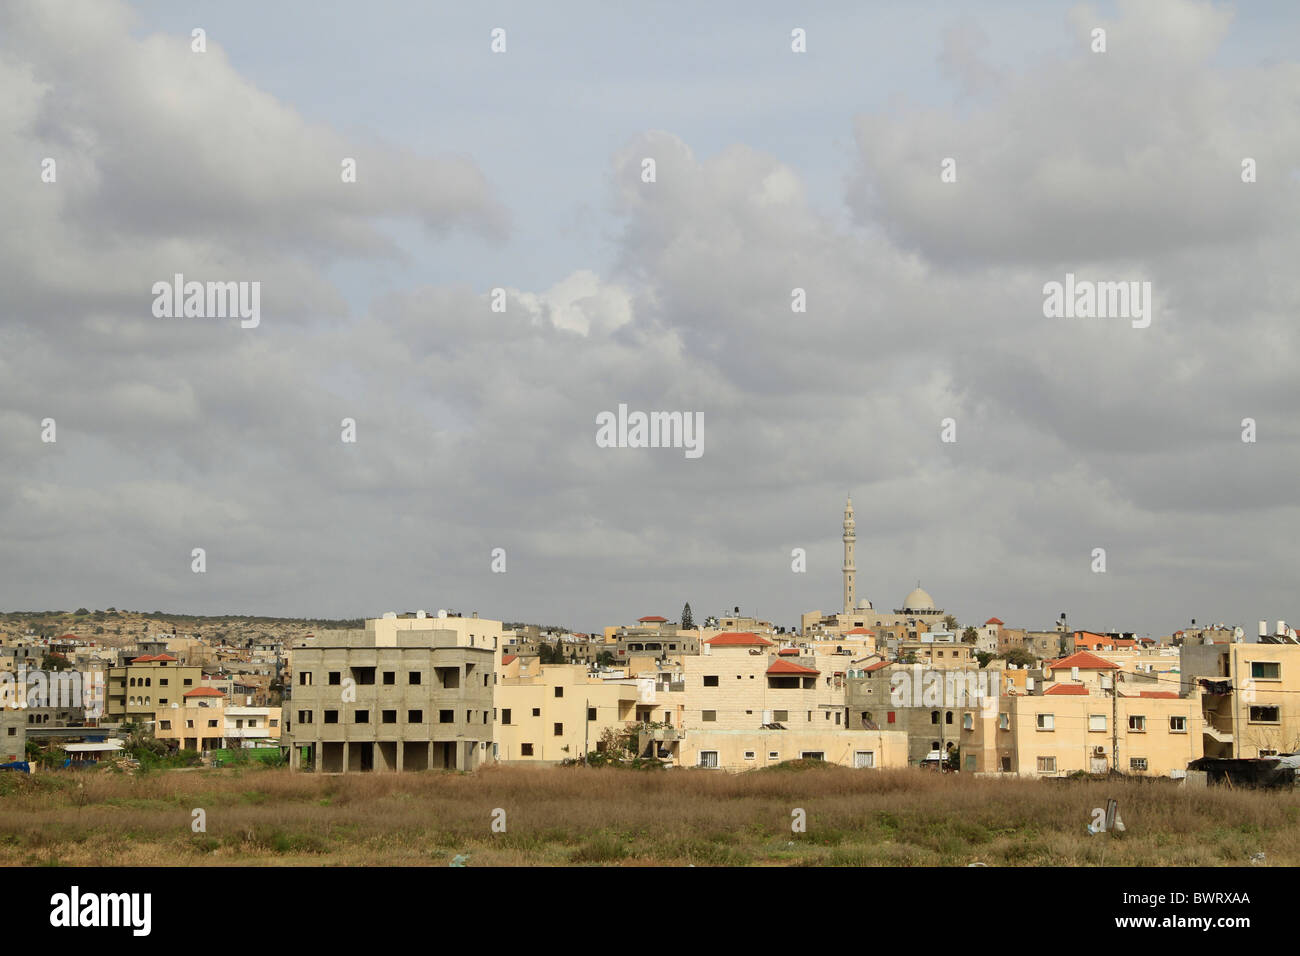 Israel, Carmel coast, Arab town Jisr az-Zarqa - Stock Image